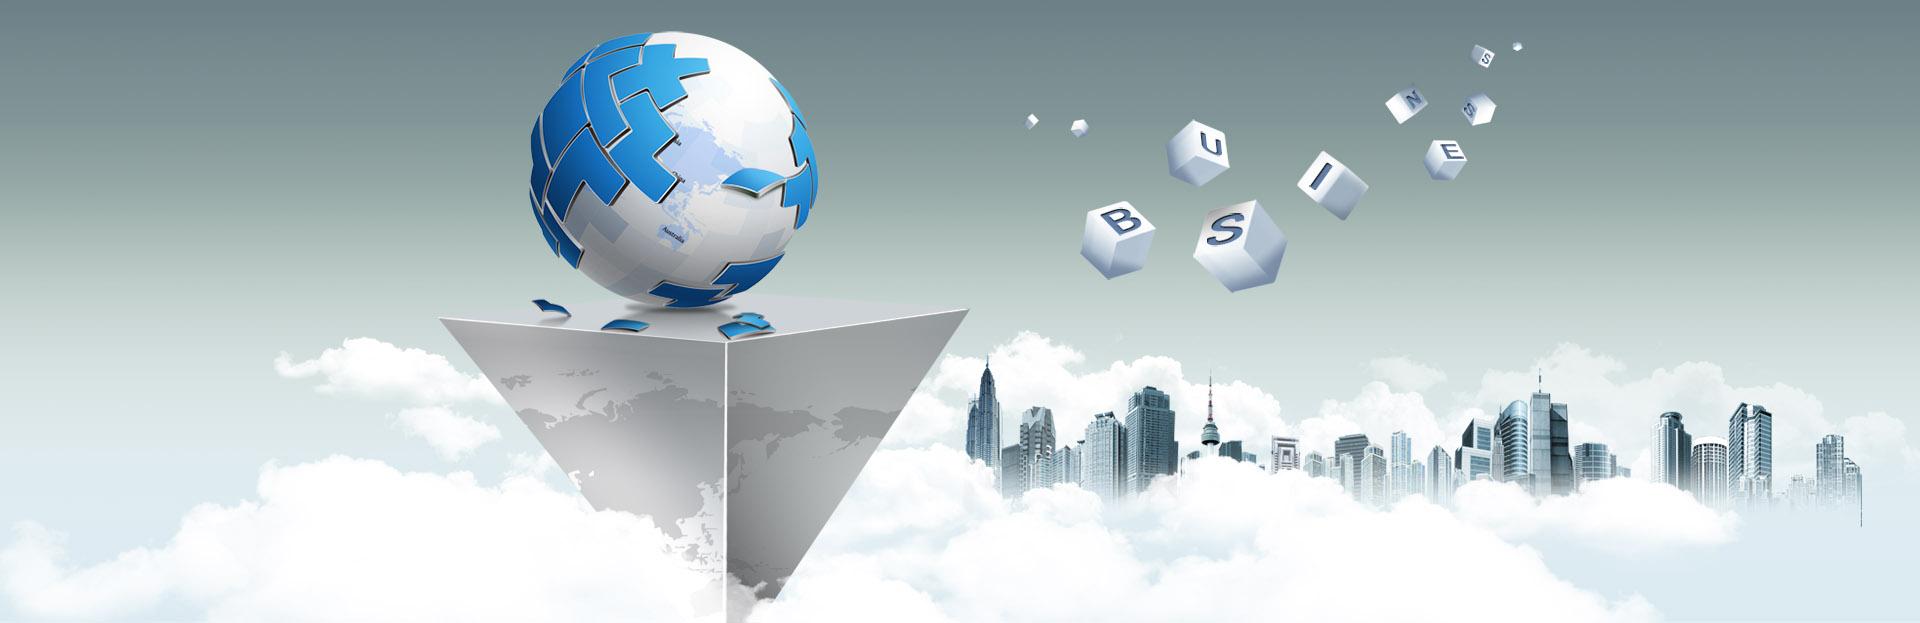 finance financial business banner ad creative  financial